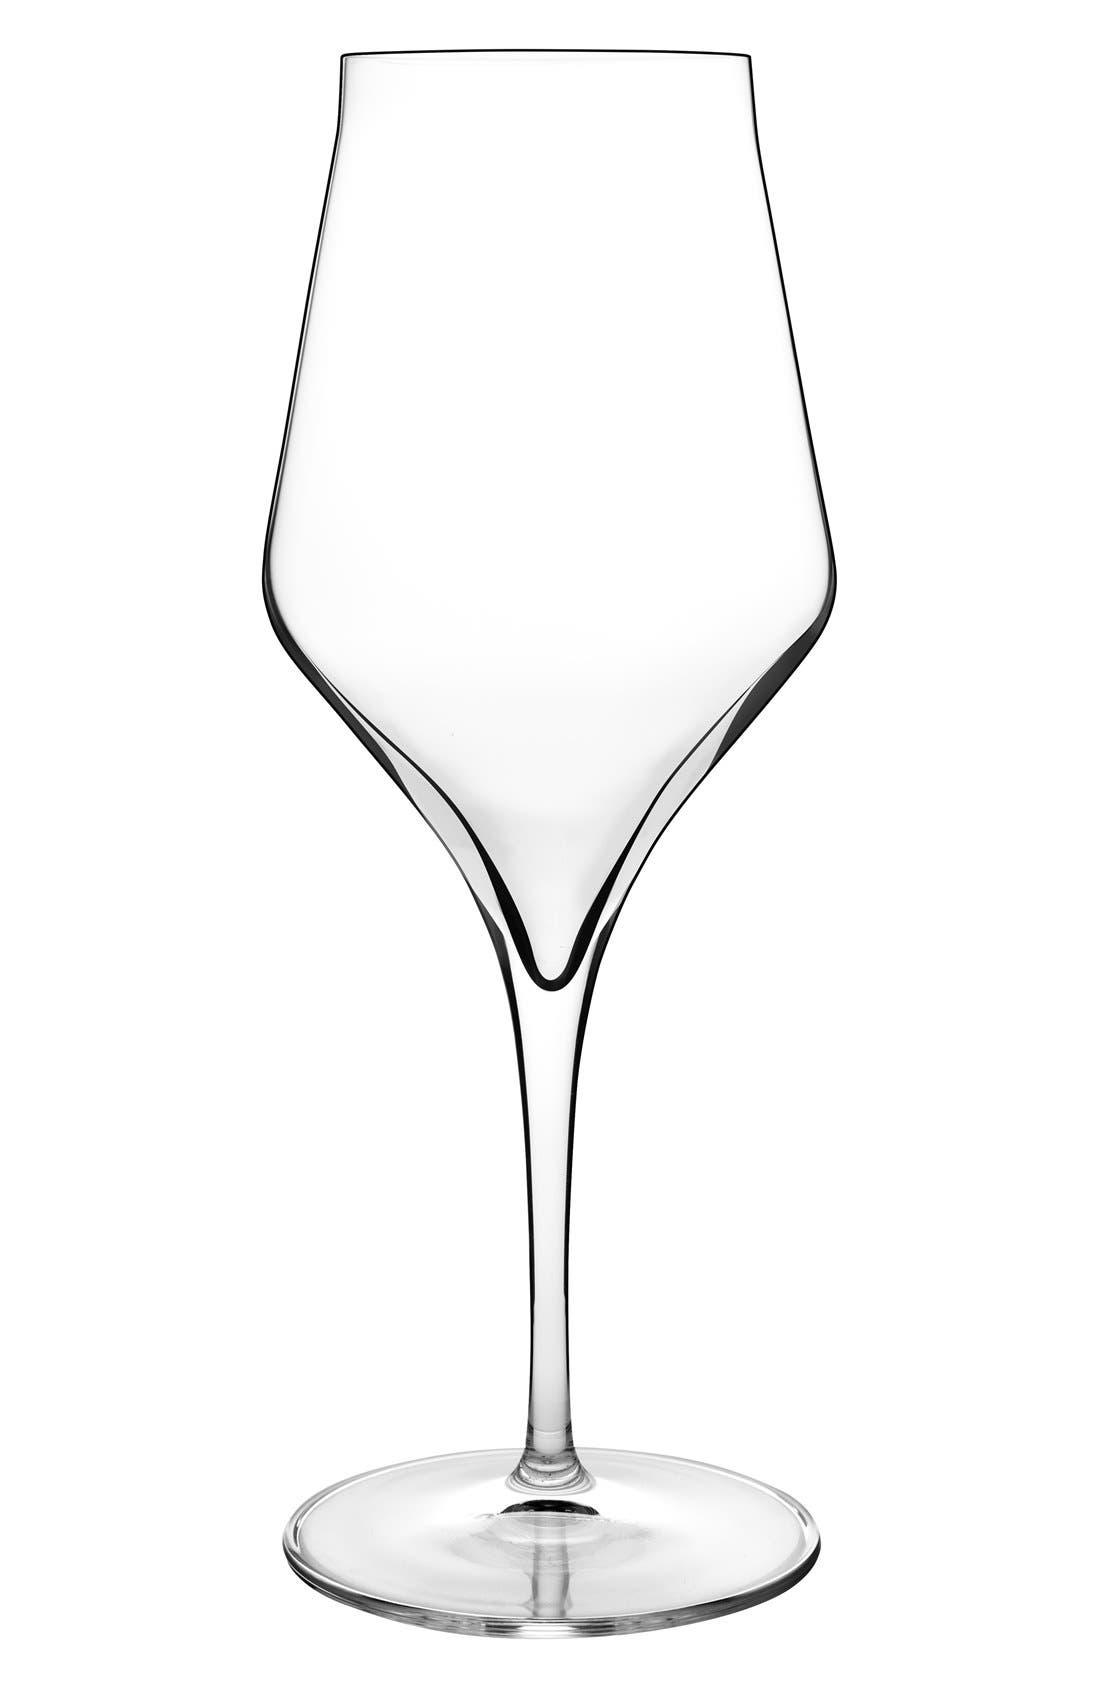 Main Image - Luigi Bormioli 'Supremo' Chianti Glasses (Set of 2)